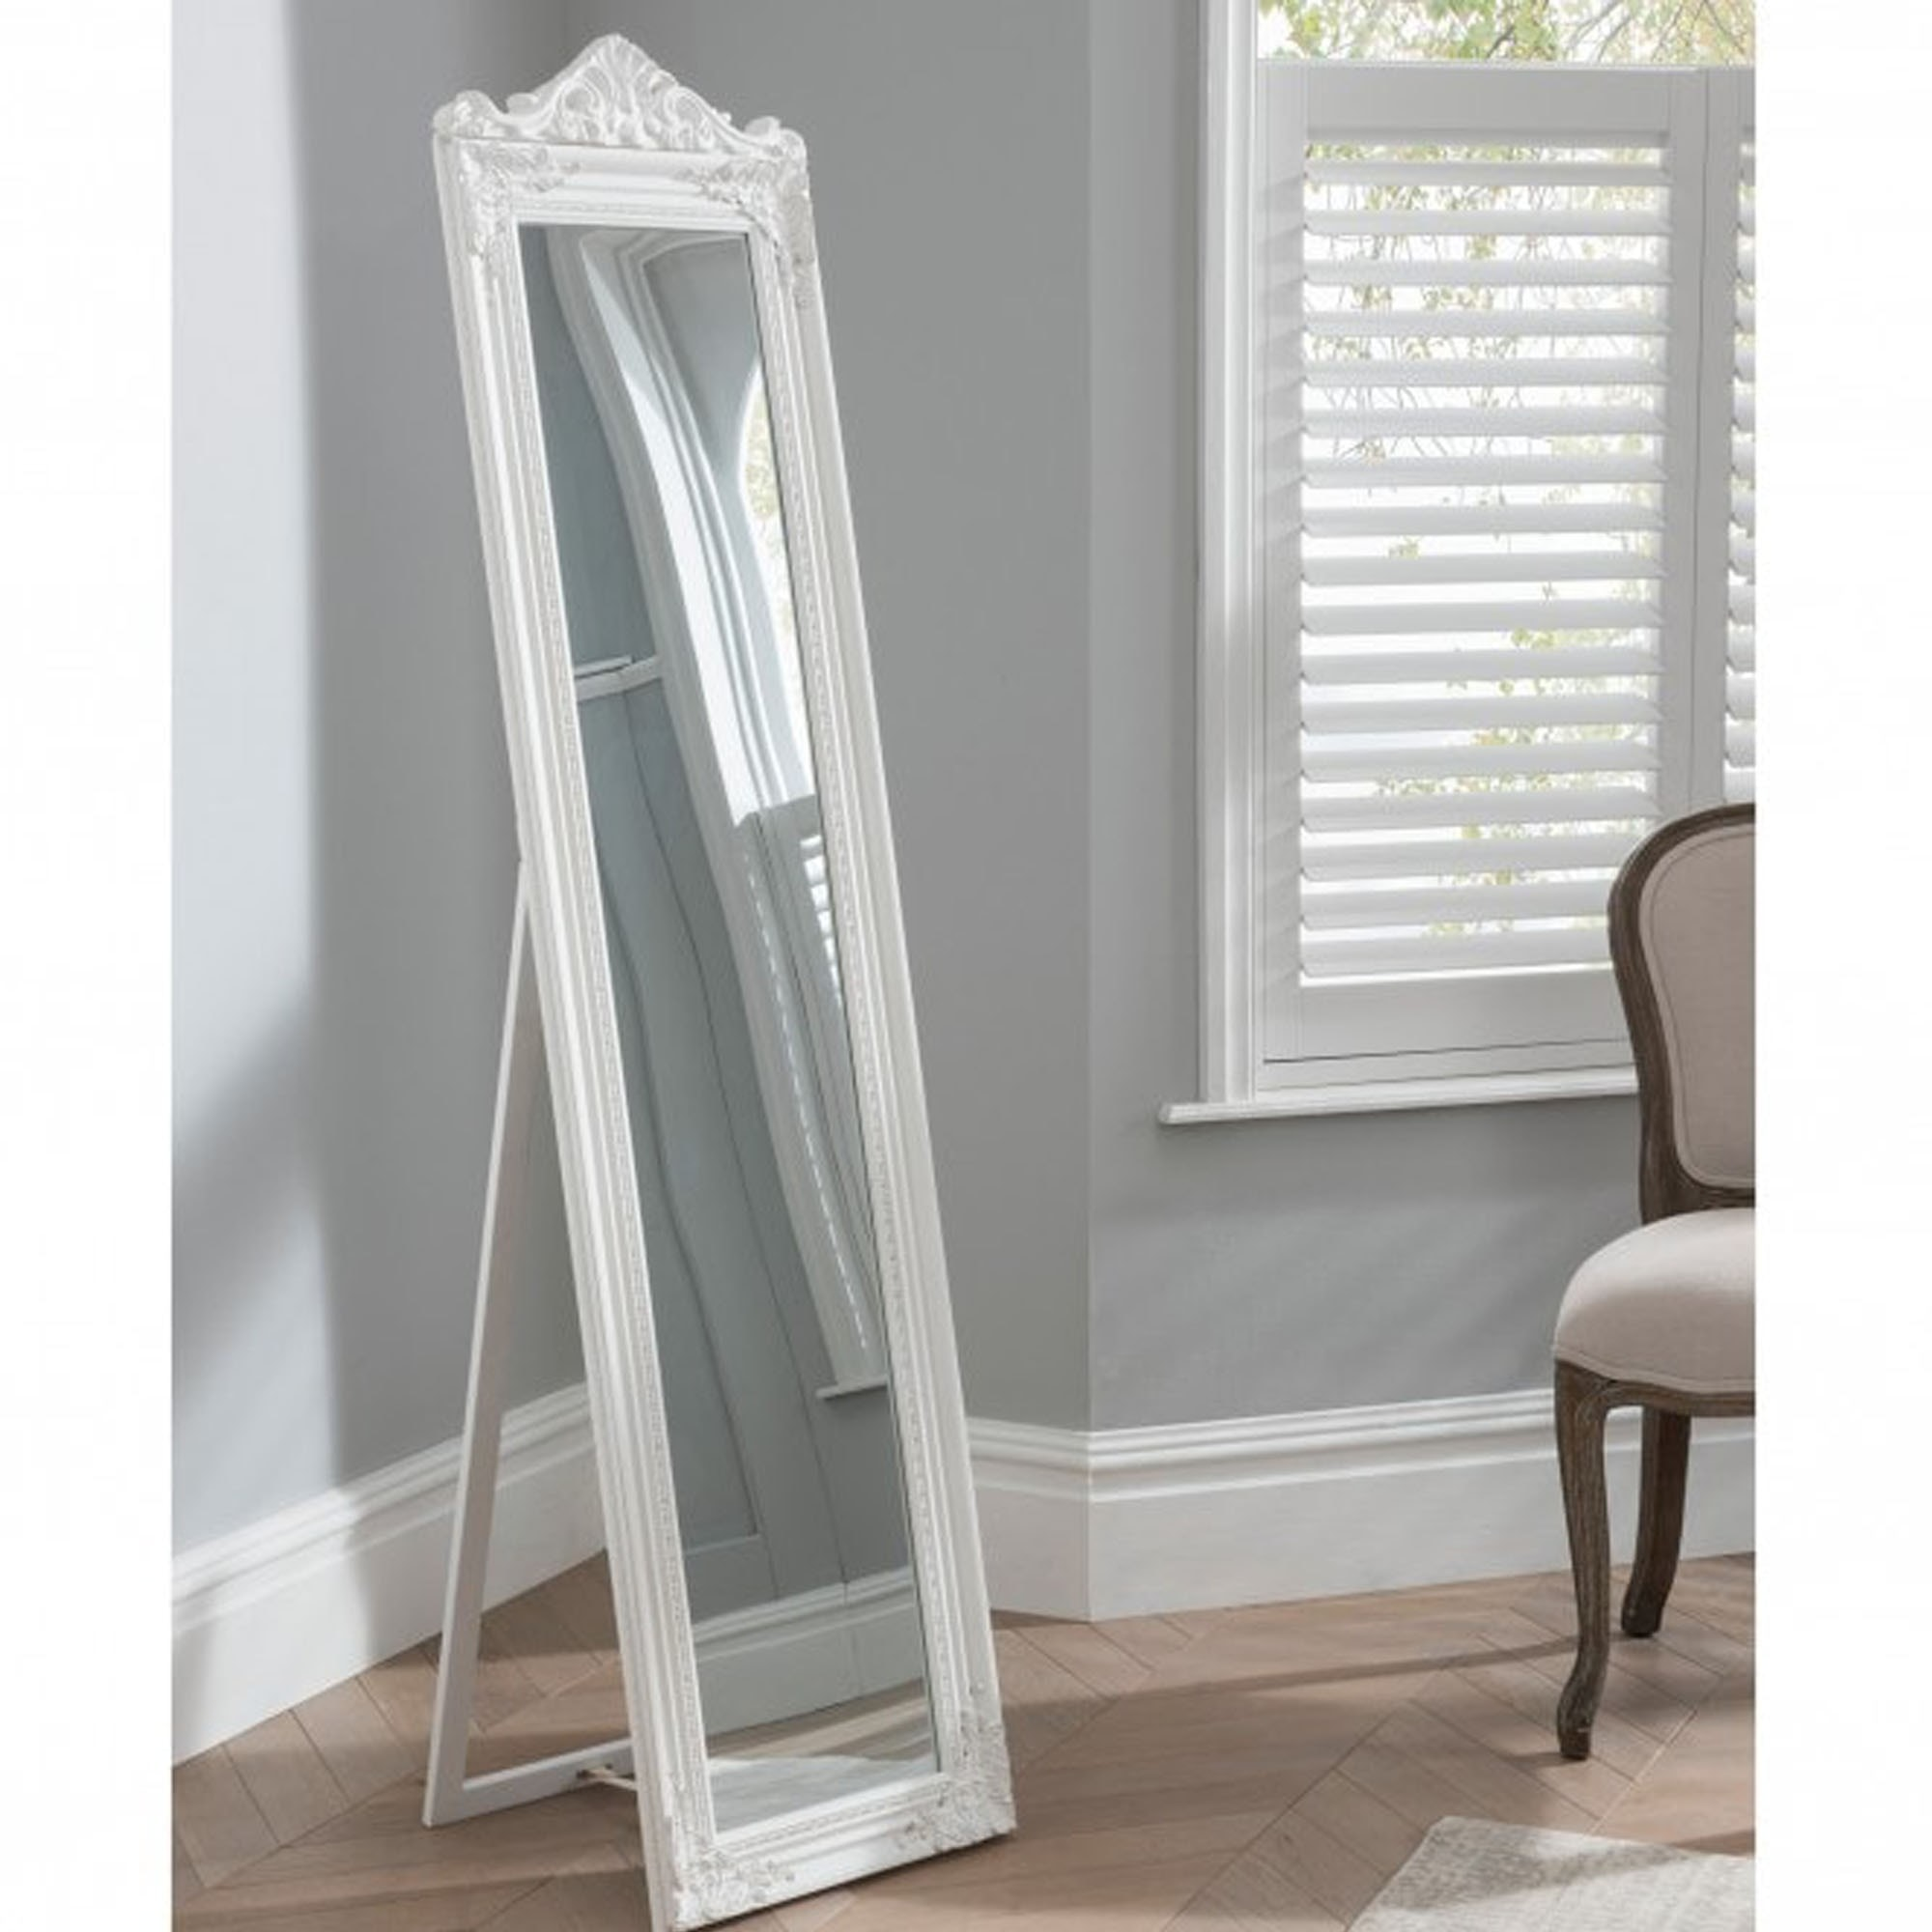 Full Length Mirror In White The Elizabeth Floor Standing Mirror